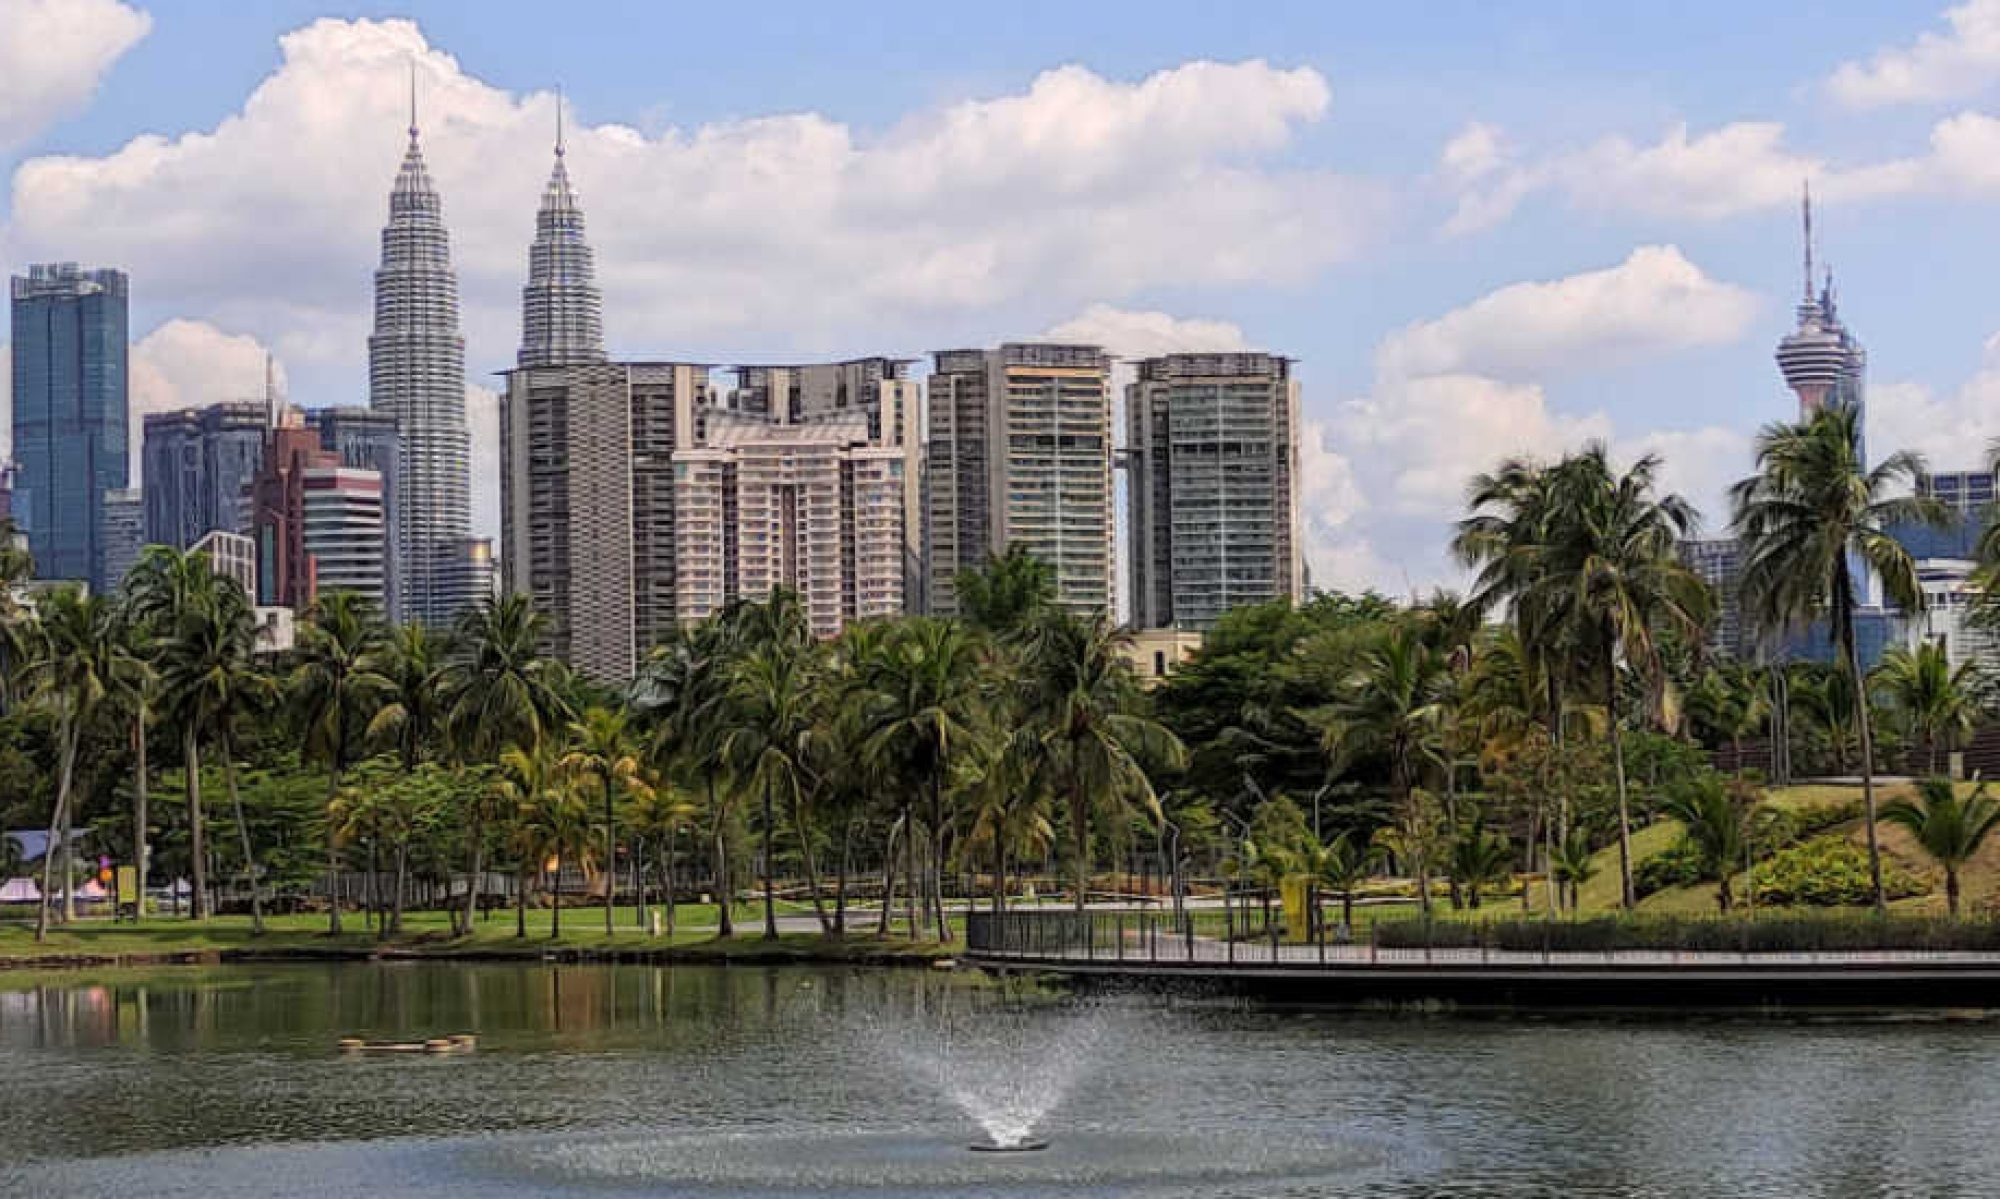 Моя Любимая Малайзия